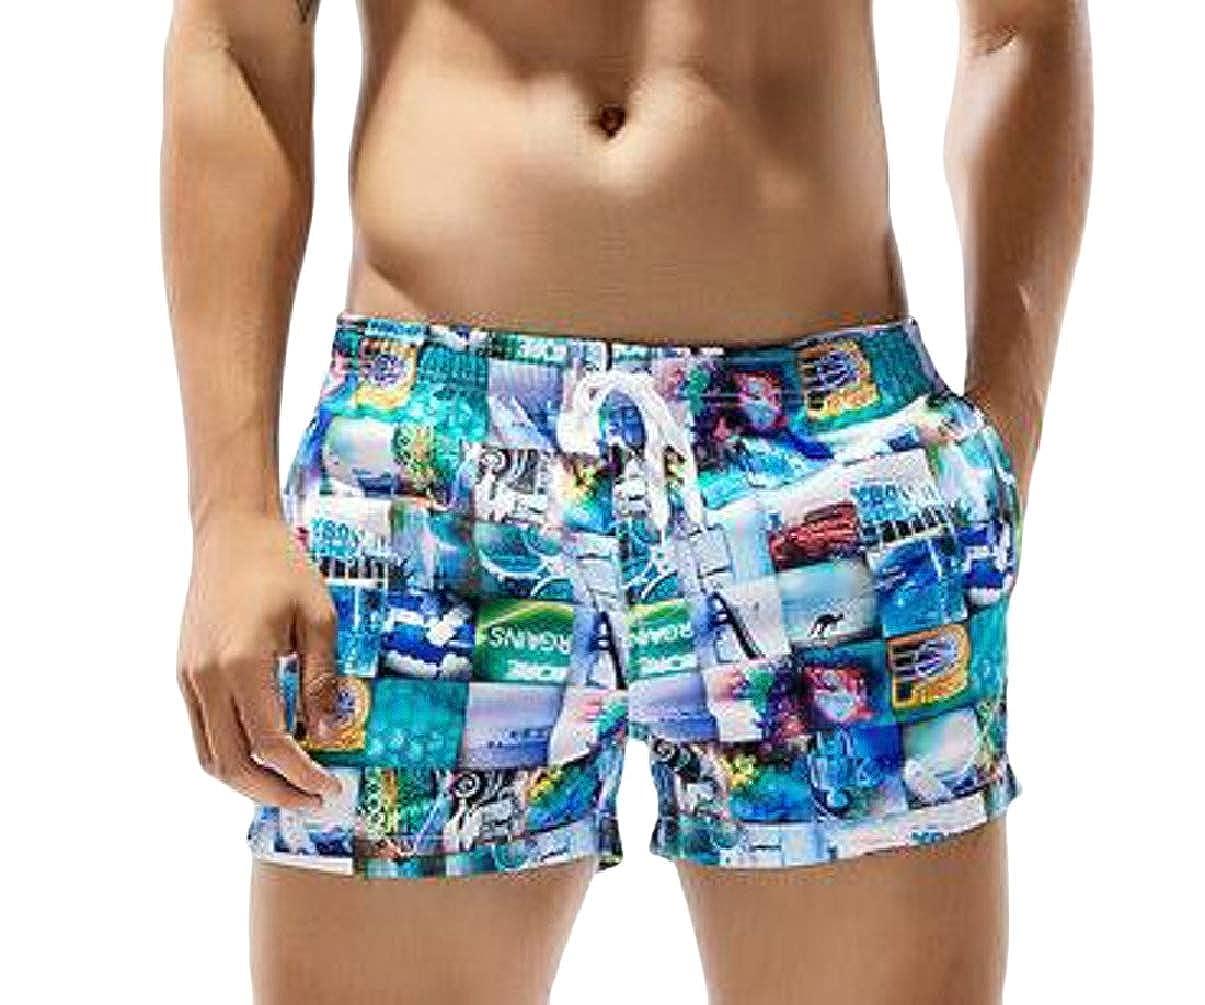 Xswsy XG Mens Camouflage Printed Beach Shorts Swim Trunks Swimming Watershort